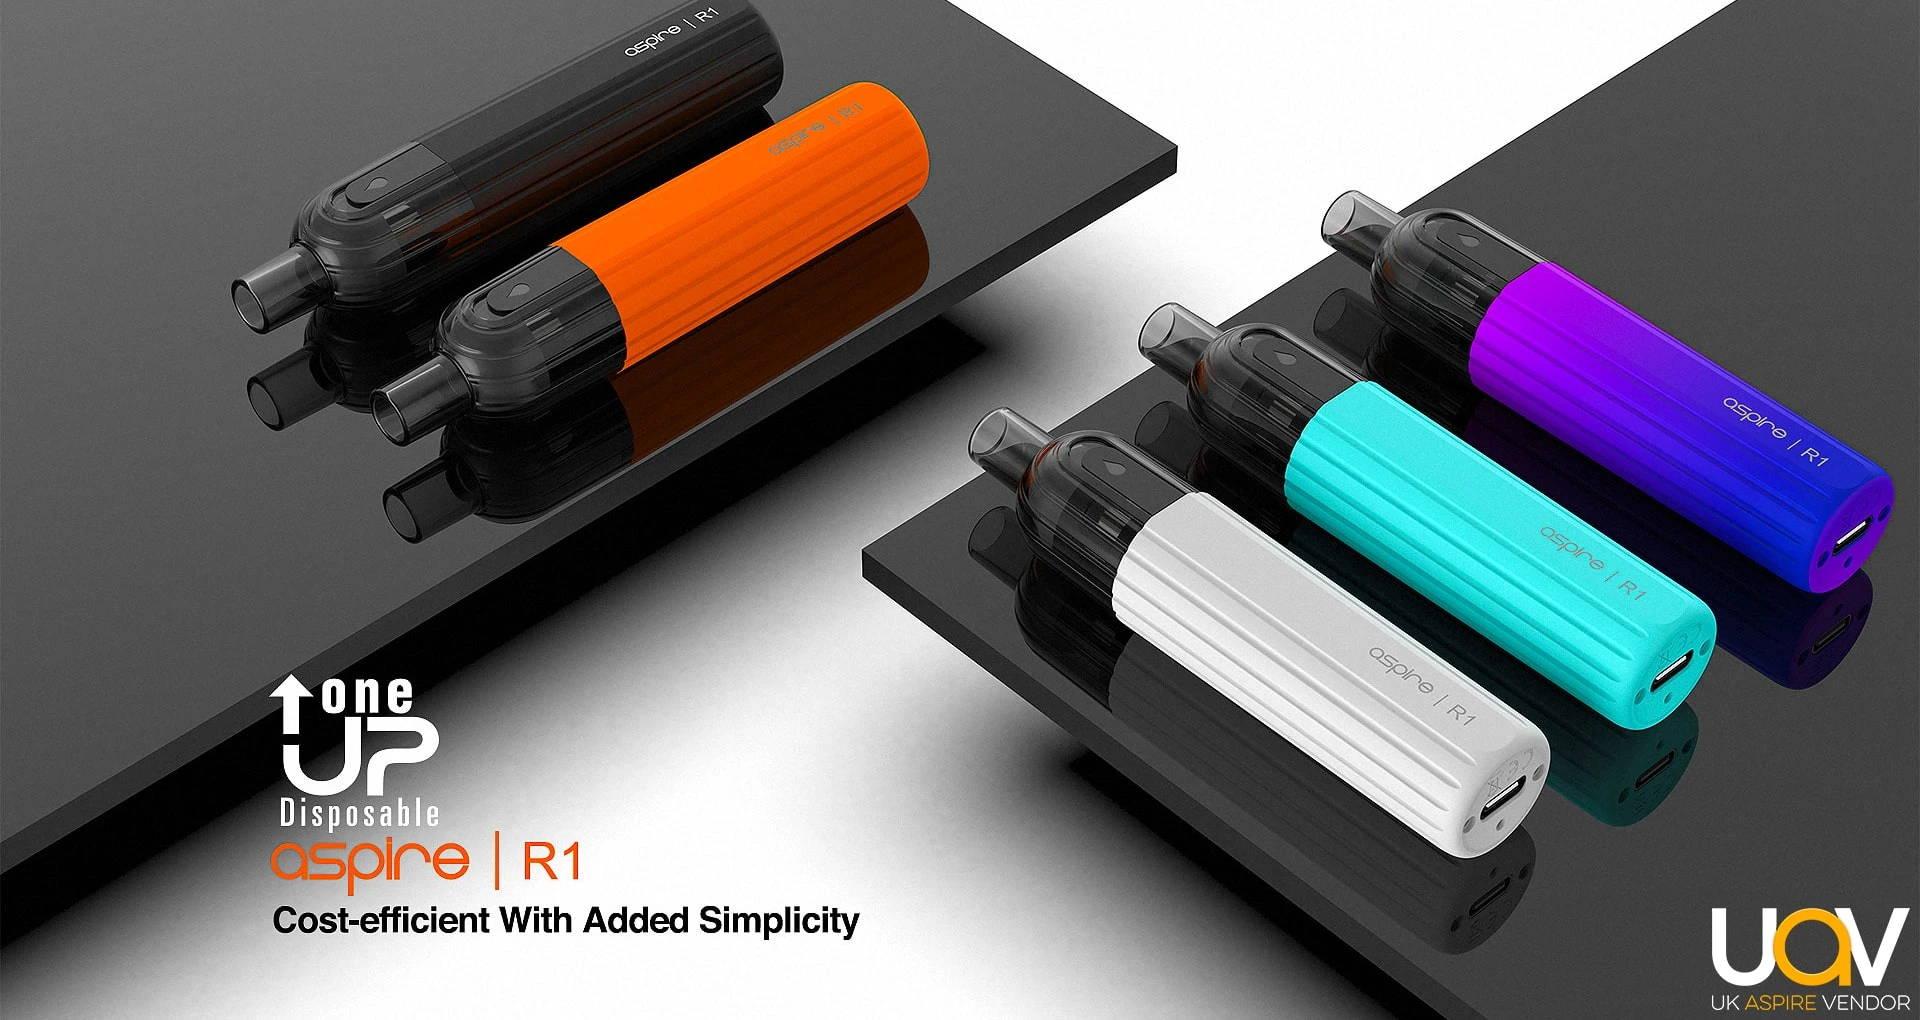 Aspire OneUp R1 | Disposable Vape Device | Buy E-Cigarette Devices